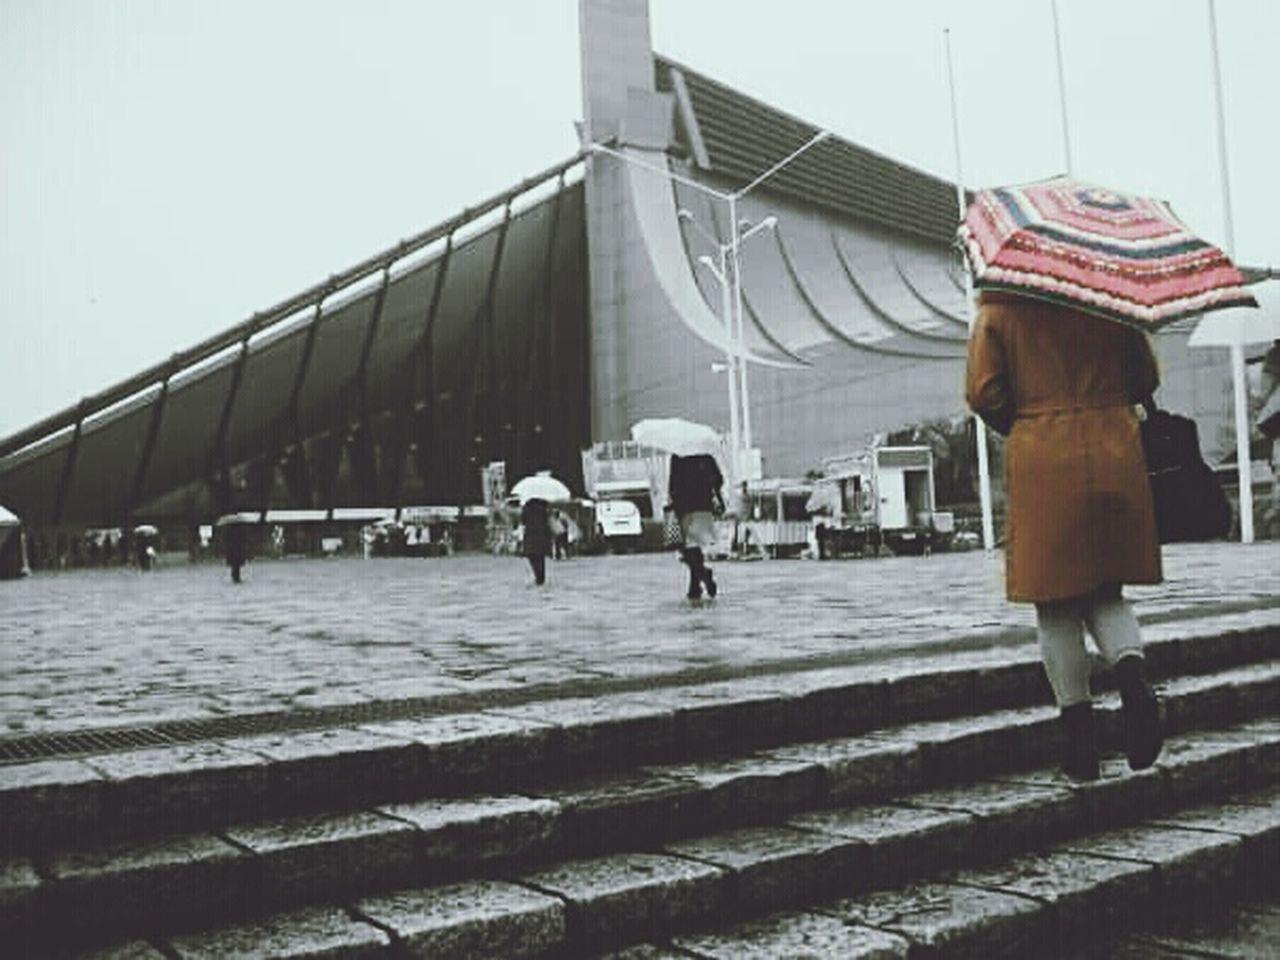 She acts like summer, and walks like rain.. ☔| 撮影地: Yoyogi National Stadium (Jinnan, Shibuya-ku, Tokyo) | 国立代々木競技場《東京都渋谷区神南》| Colorsplash Architecture by KenzoTange 丹下健三 国立代々木競技場第一体育館 Yoyogi National Gymnasium Real People Full Frame Umbrella☂☂ Winter Rain Built Structure Building Exterior Tokyo Cityscape City Life City View  Rear View Street Photography Color Splash Drastic Edit Edit Junkie EyeEm Gallery EyeEm Best Shots EyeEmNewHere EyeEm Best Shots - Architecture